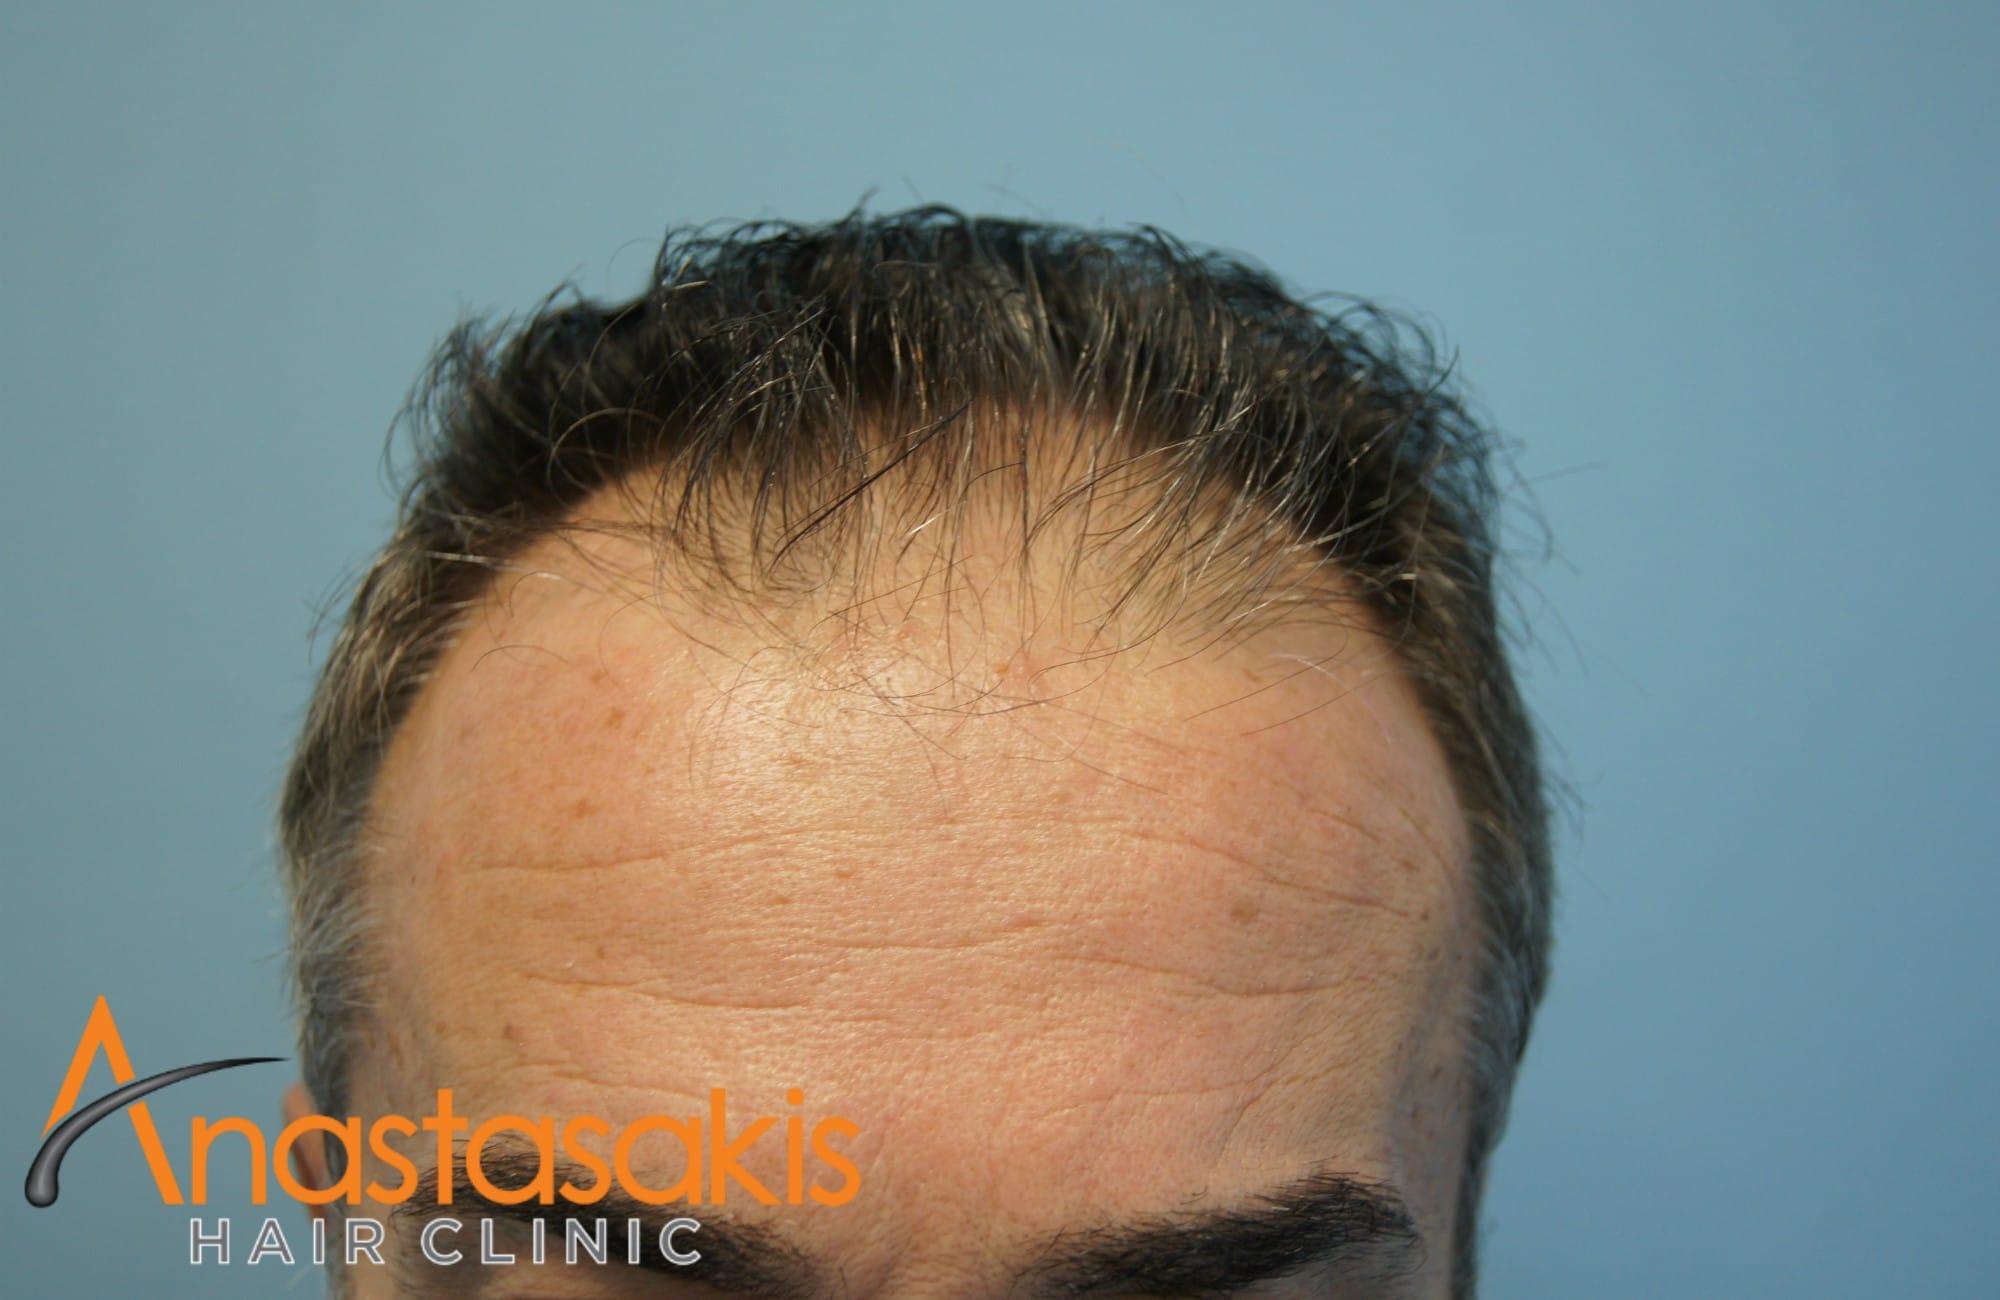 hairline ασθενούς πριν τη μεταμοσχευση μαλλιων με 2153 fus